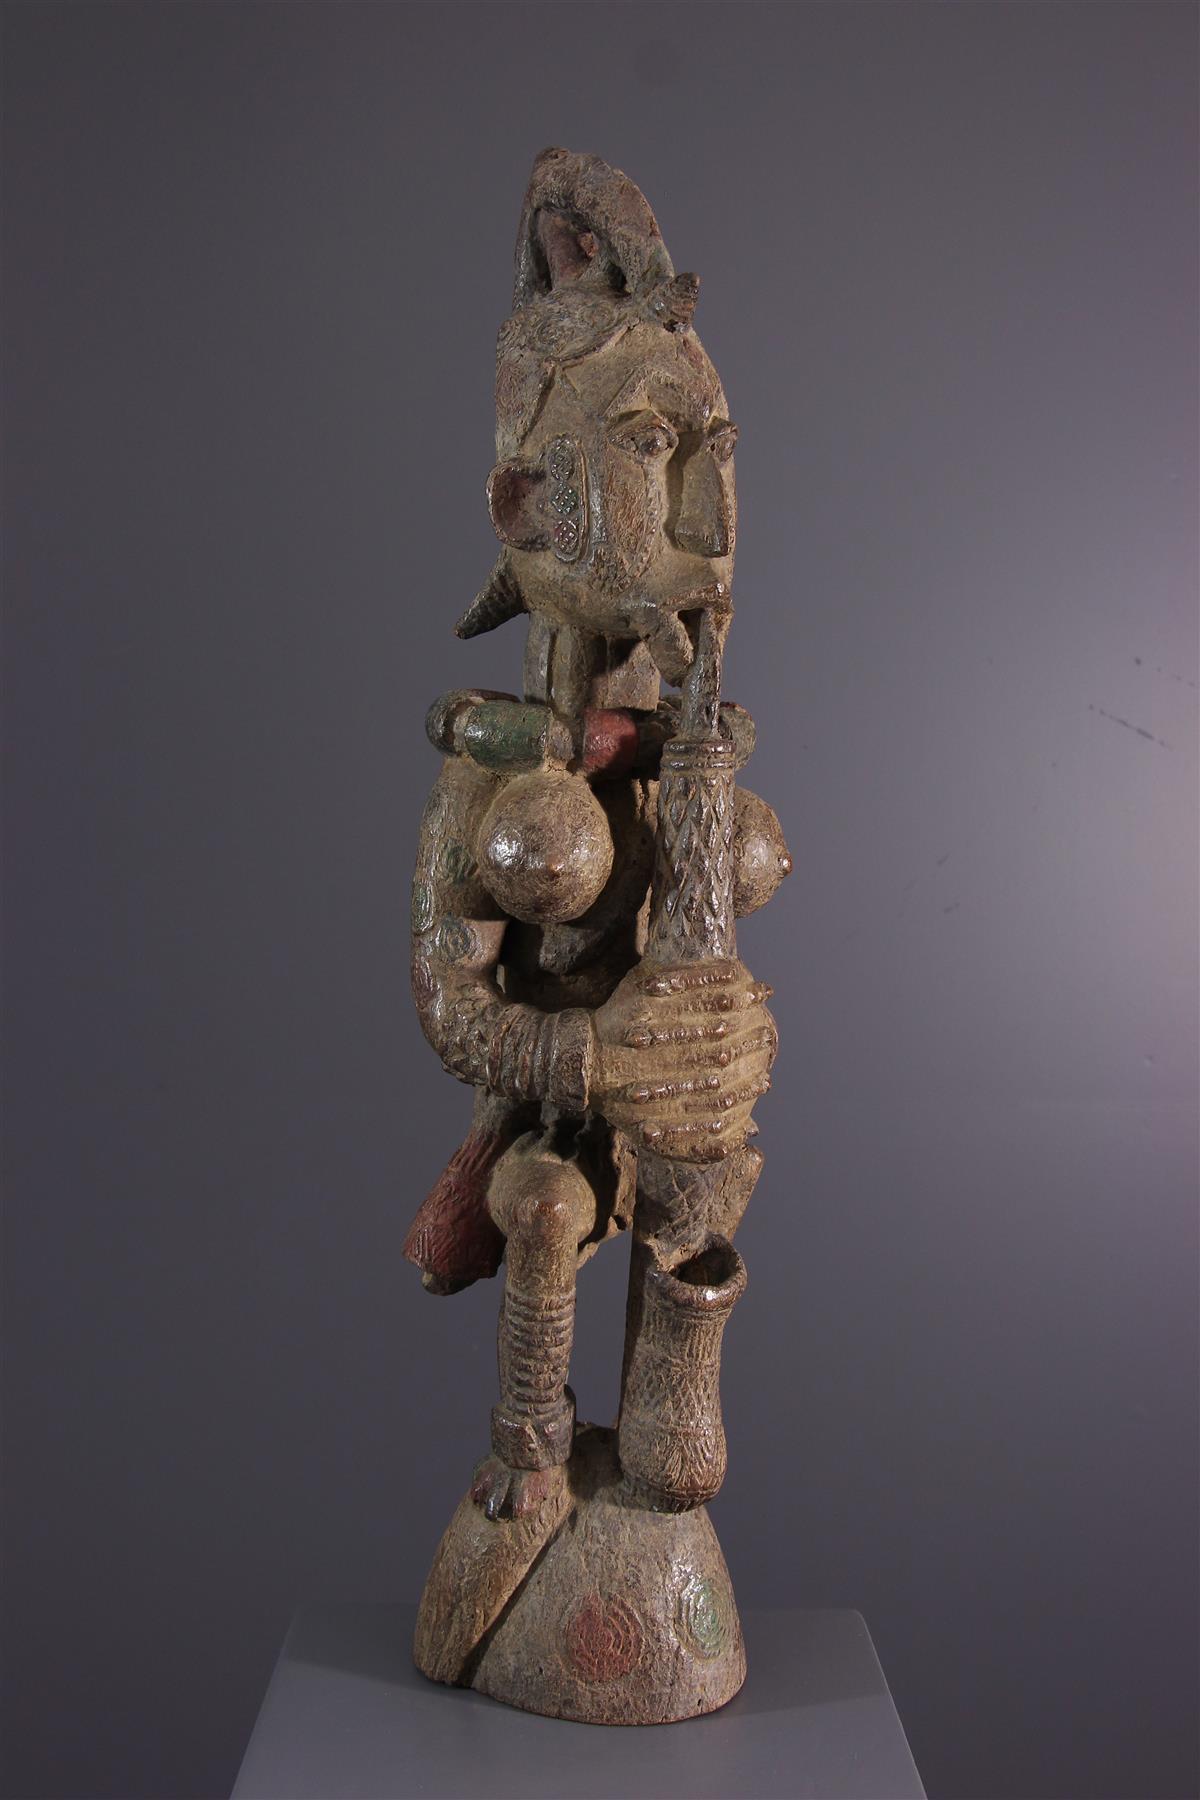 Igbo standbeeld - Afrikaanse kunst